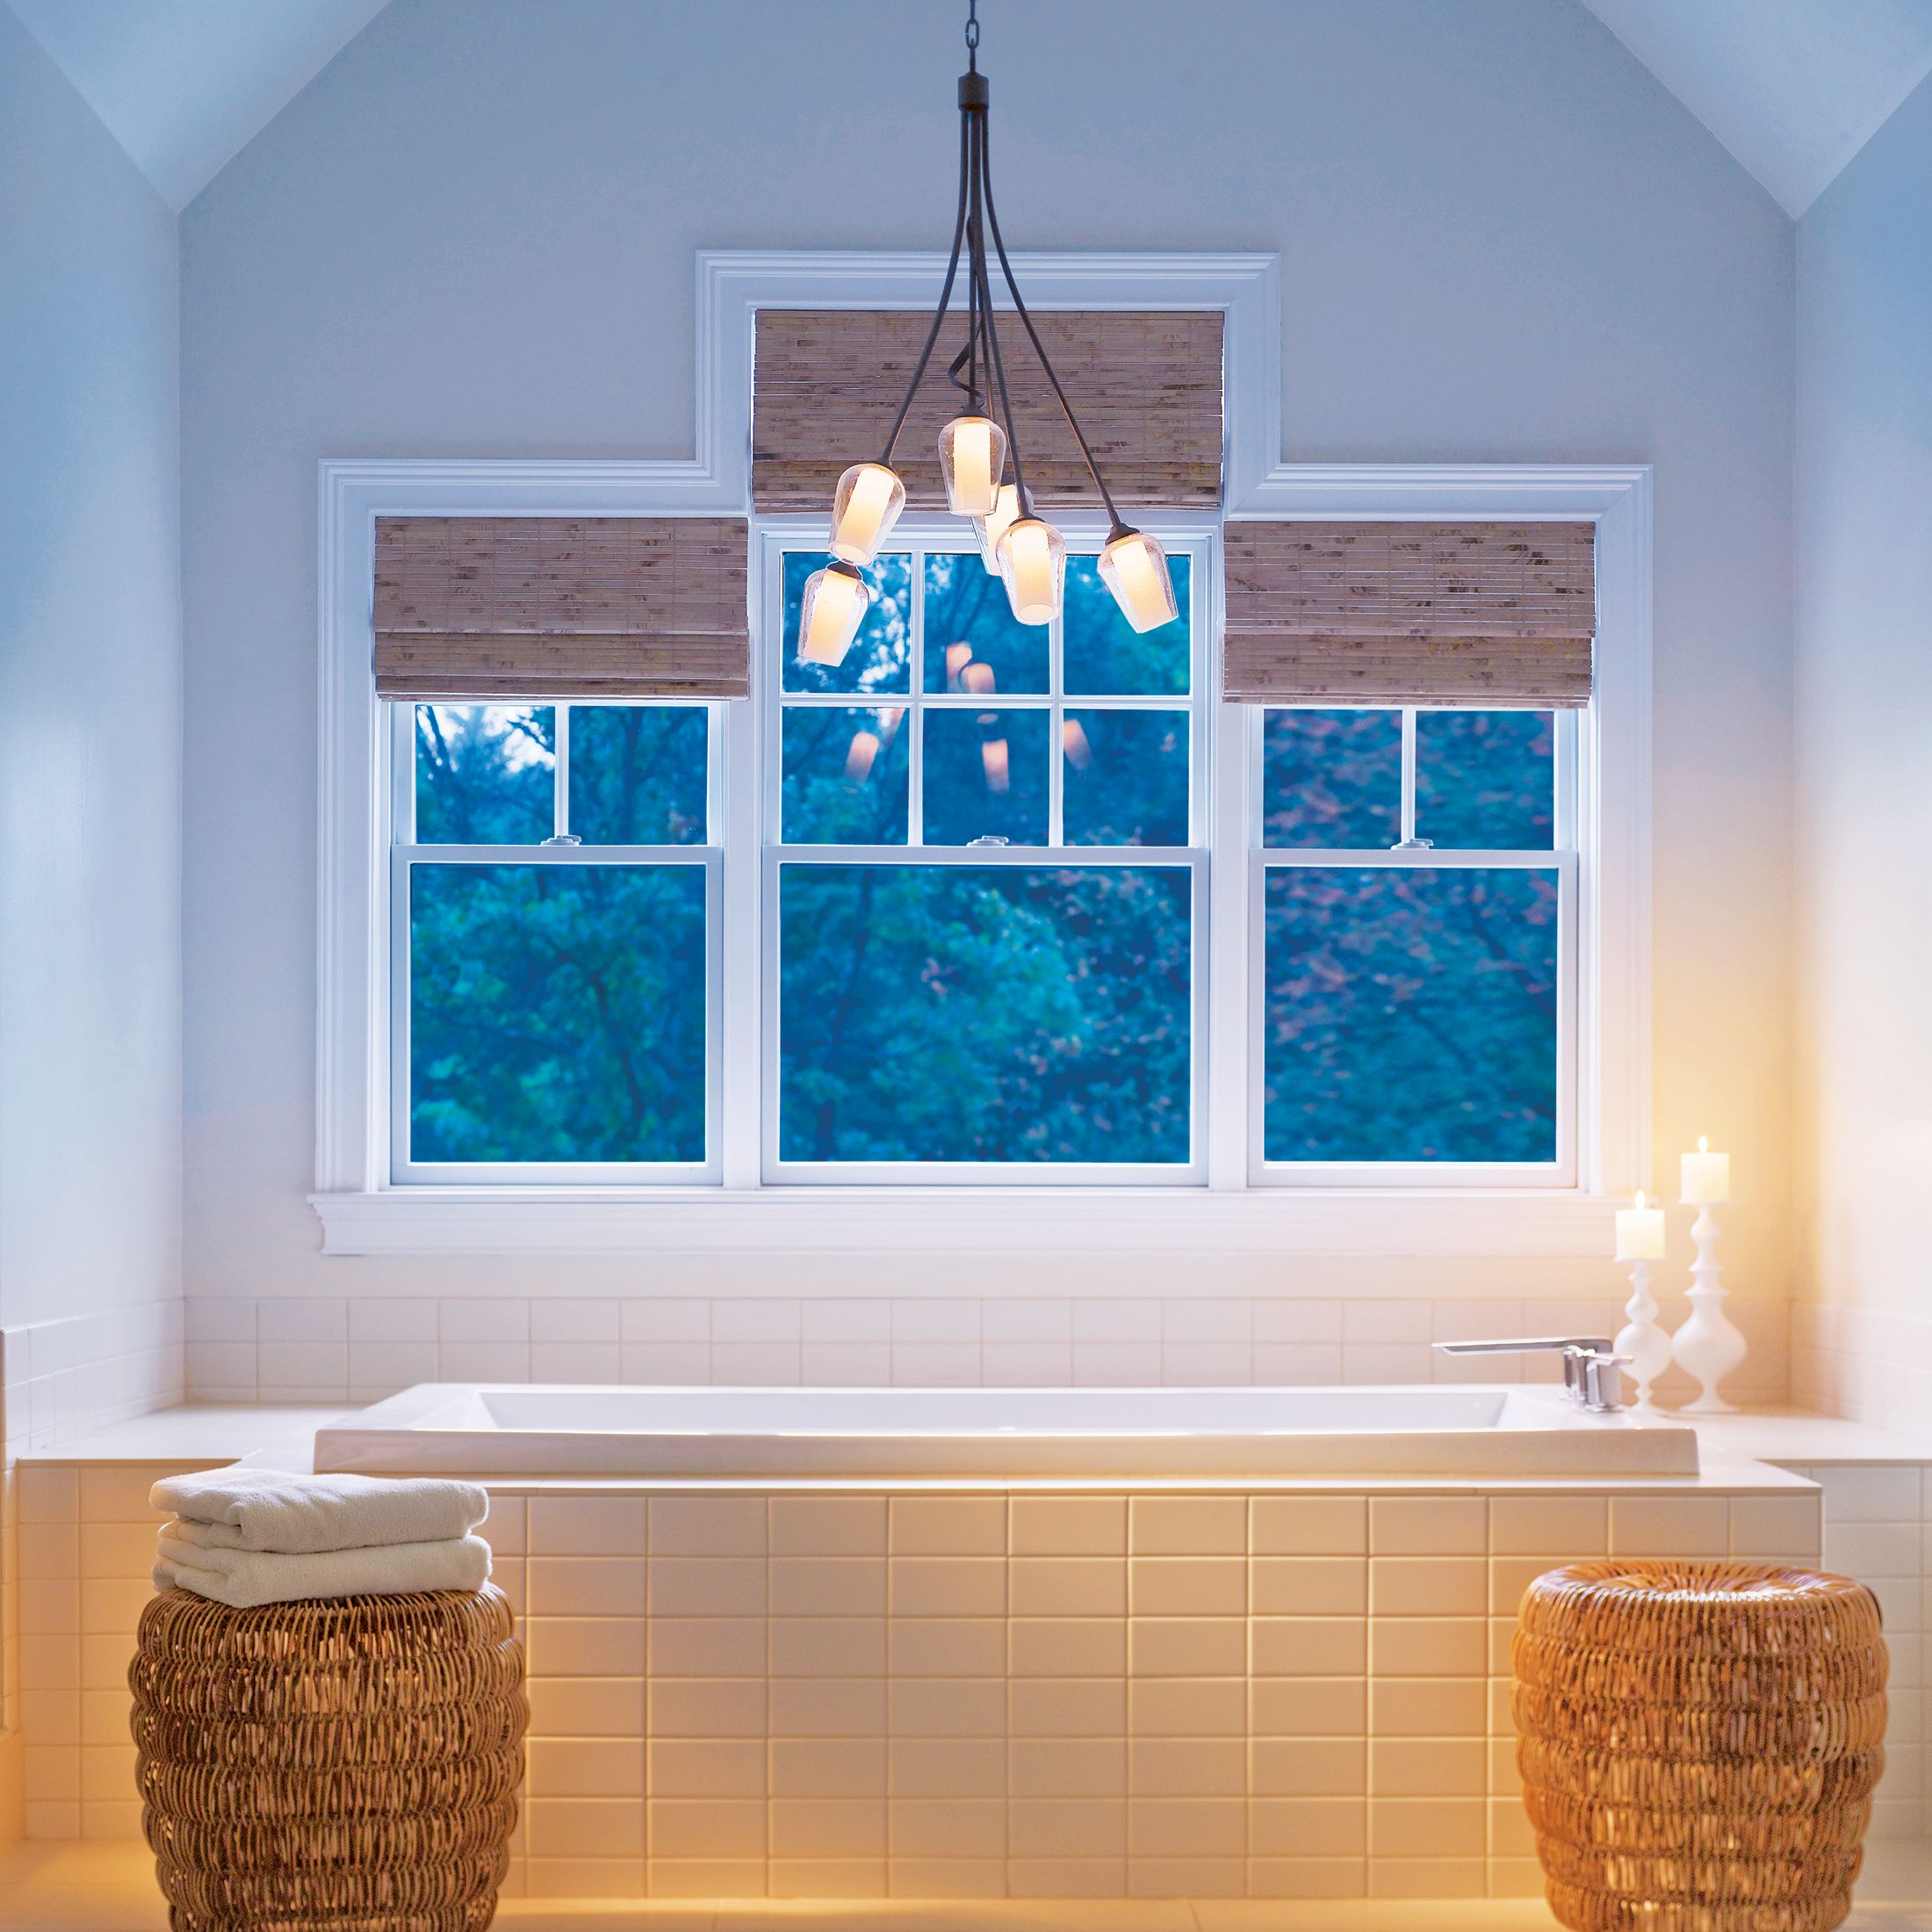 3 common bathroom lighting mistakes to